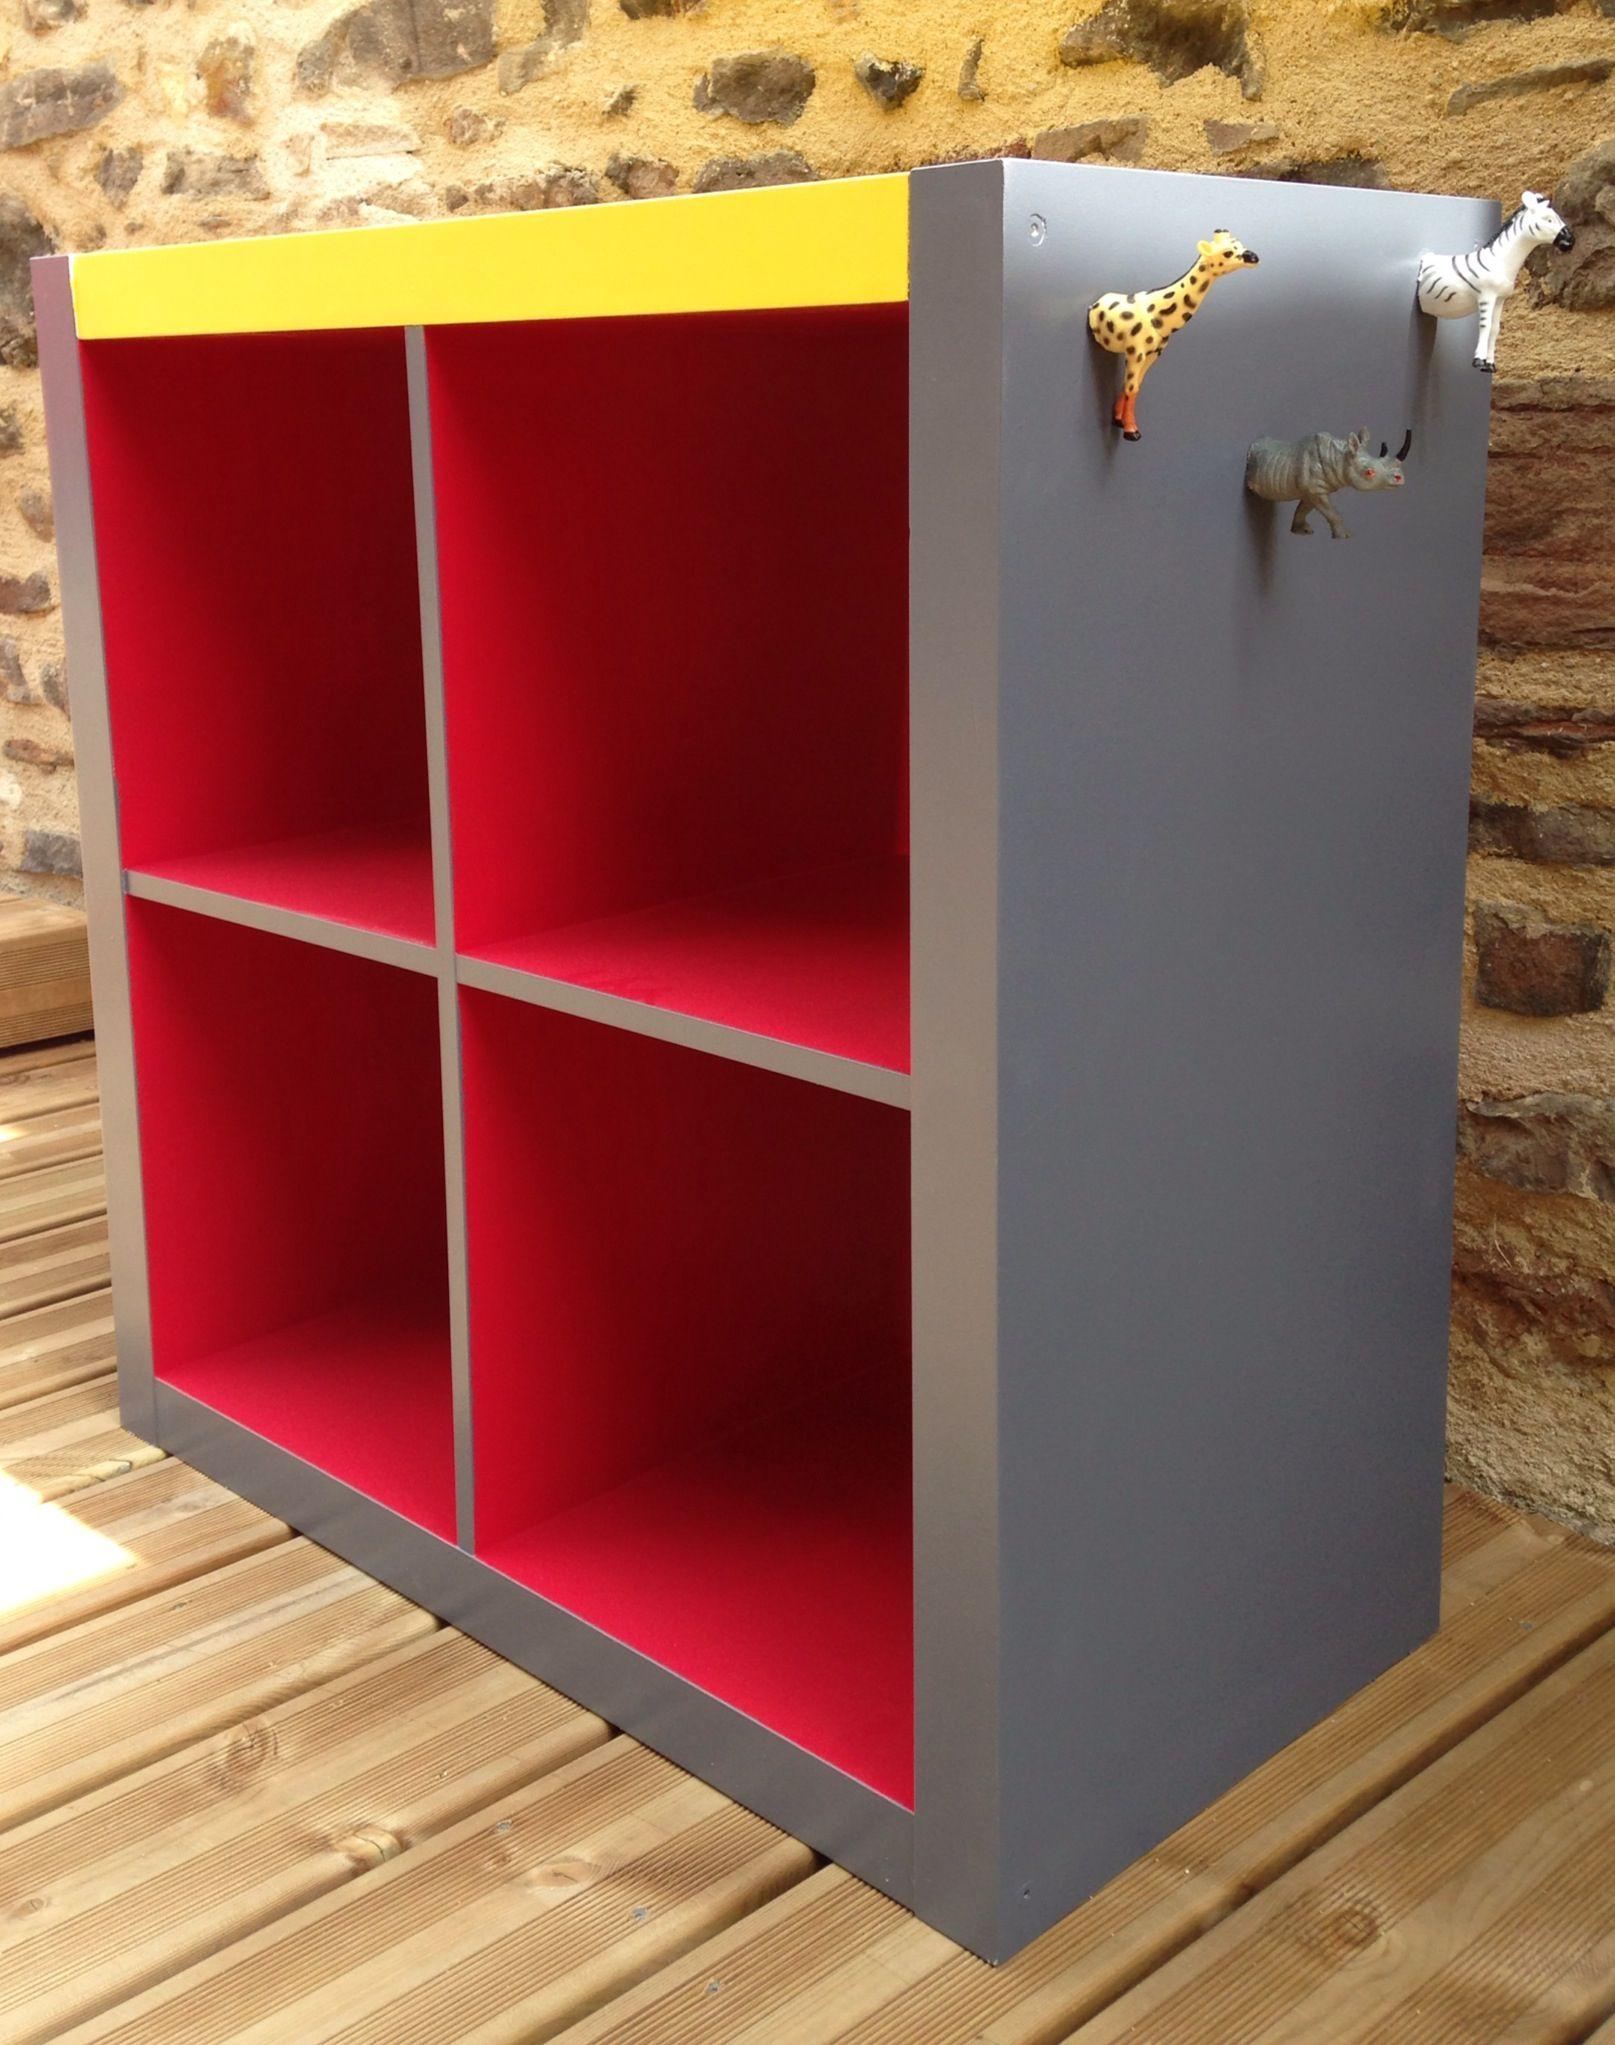 Rangement expedit d 39 ikea relook angus atelier de relooking de meubles vintage industriel - Personnaliser meuble ikea ...